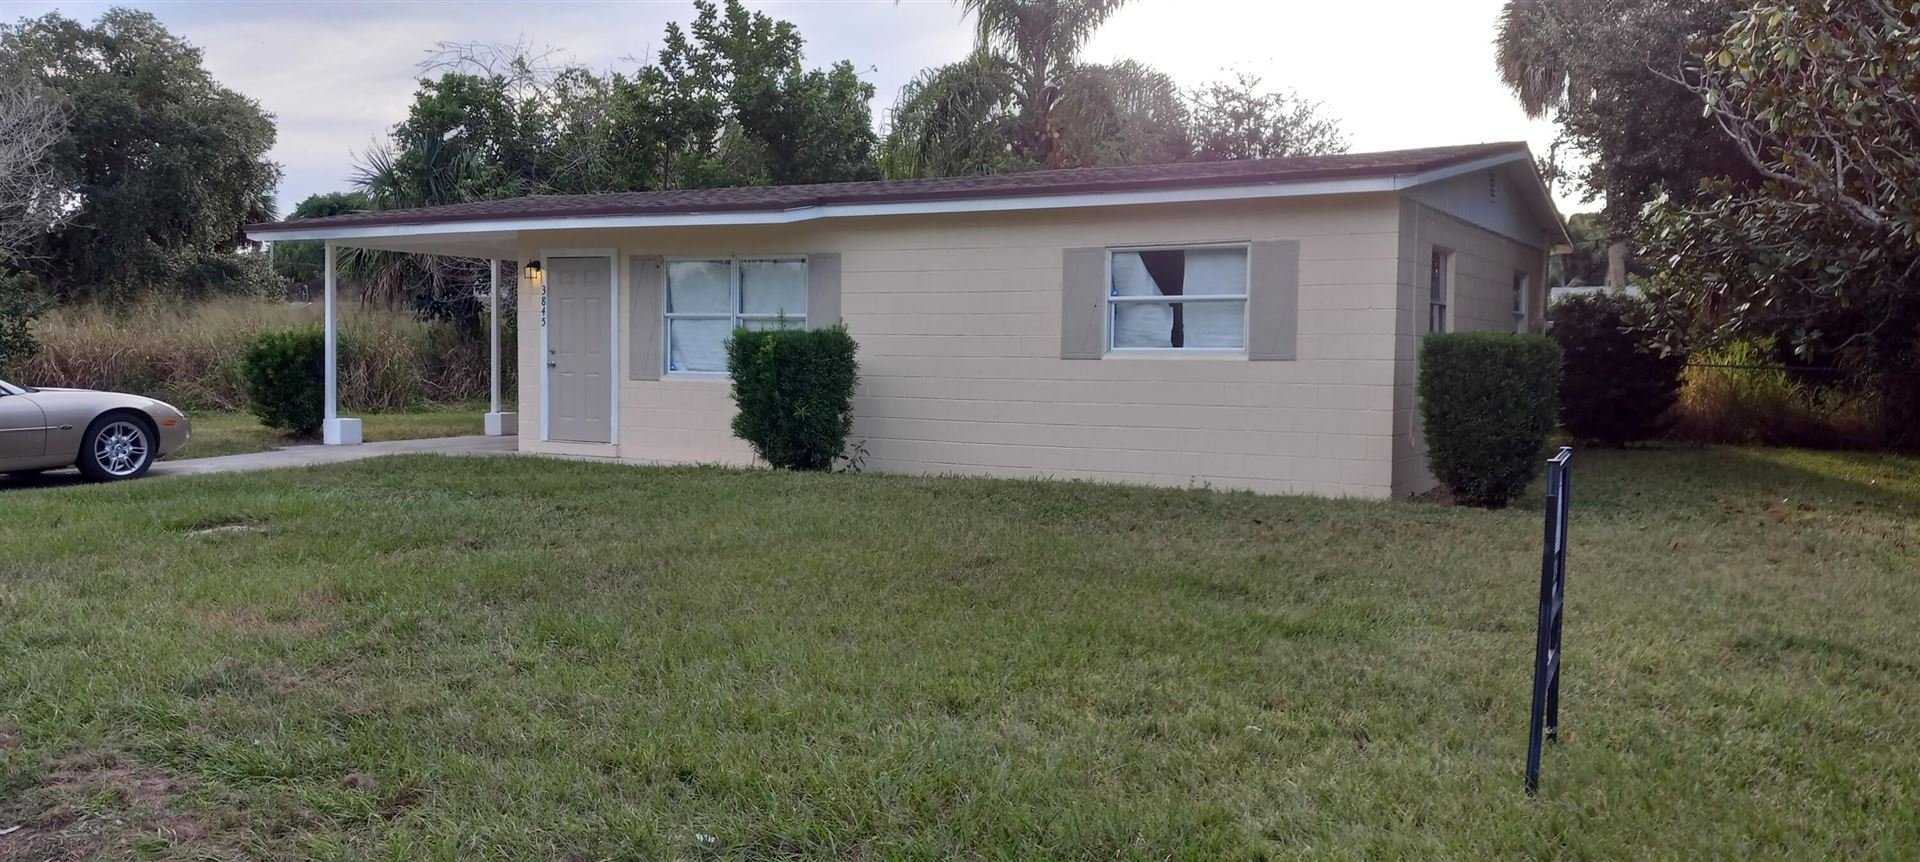 3845 17th Avenue, Vero Beach, FL 32960 - #: RX-10754187